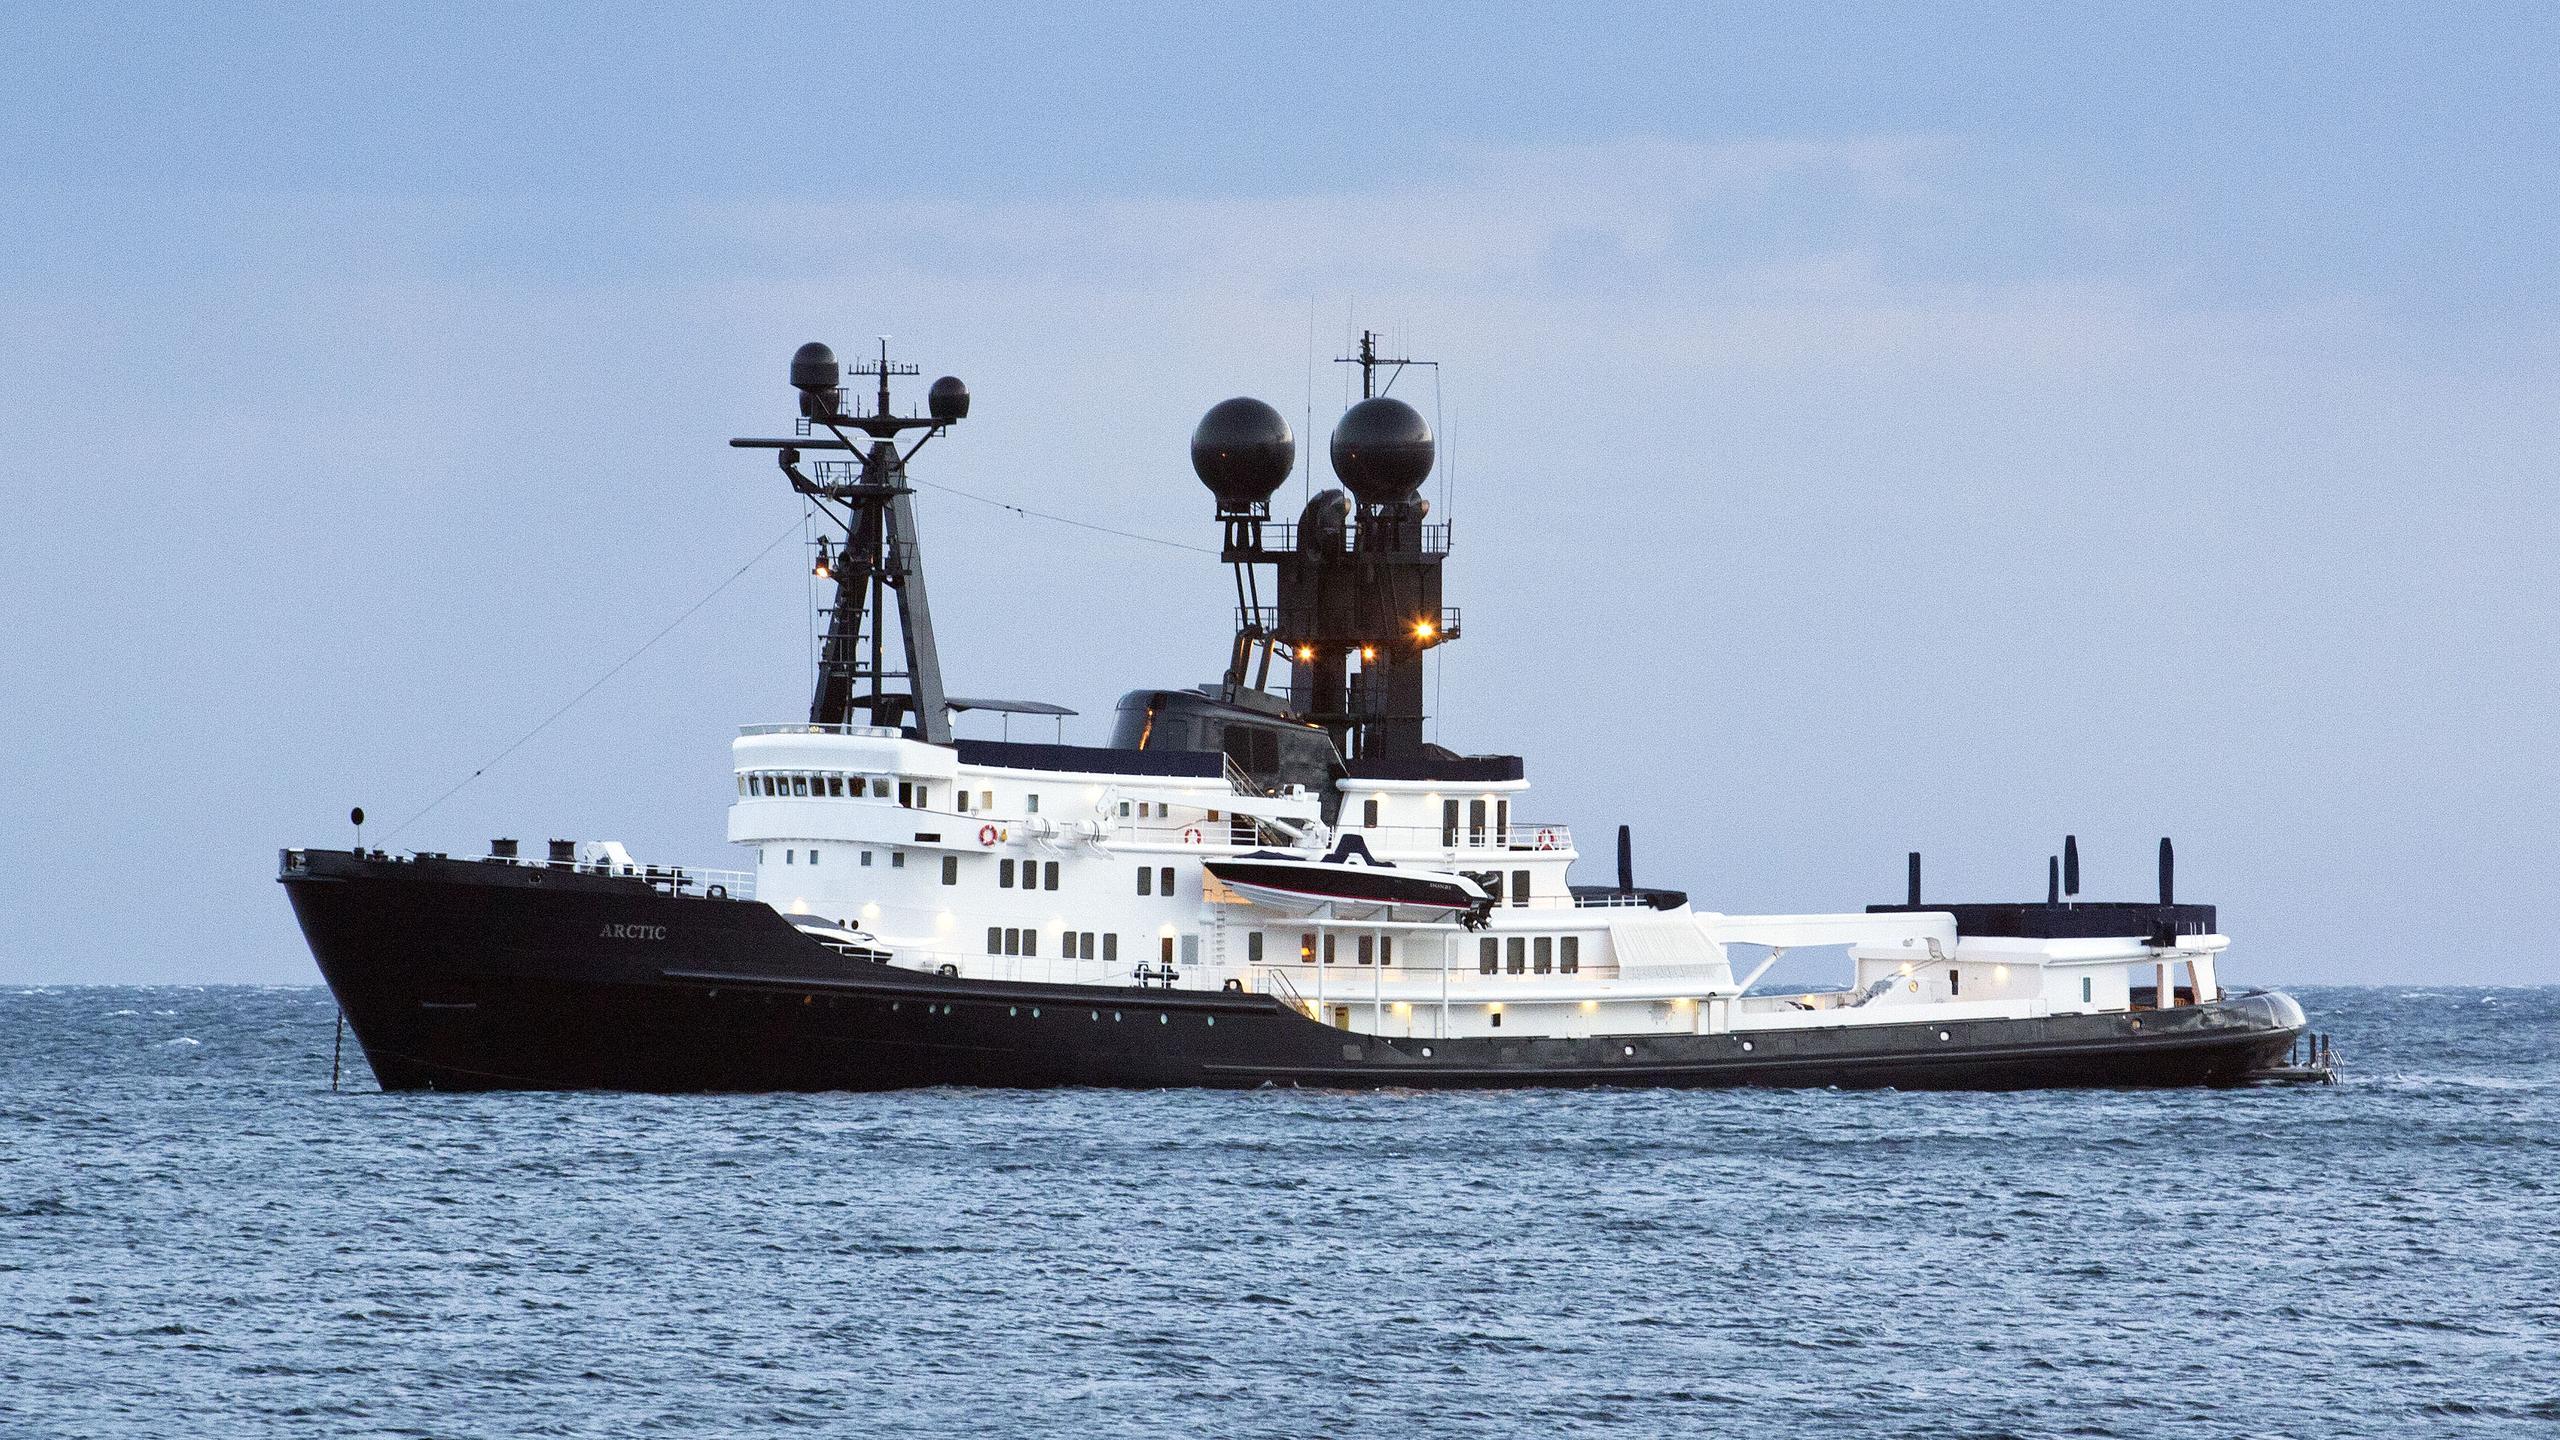 arctic-p-explorer-yacht-schichau-unterweser-1969-88m-profile